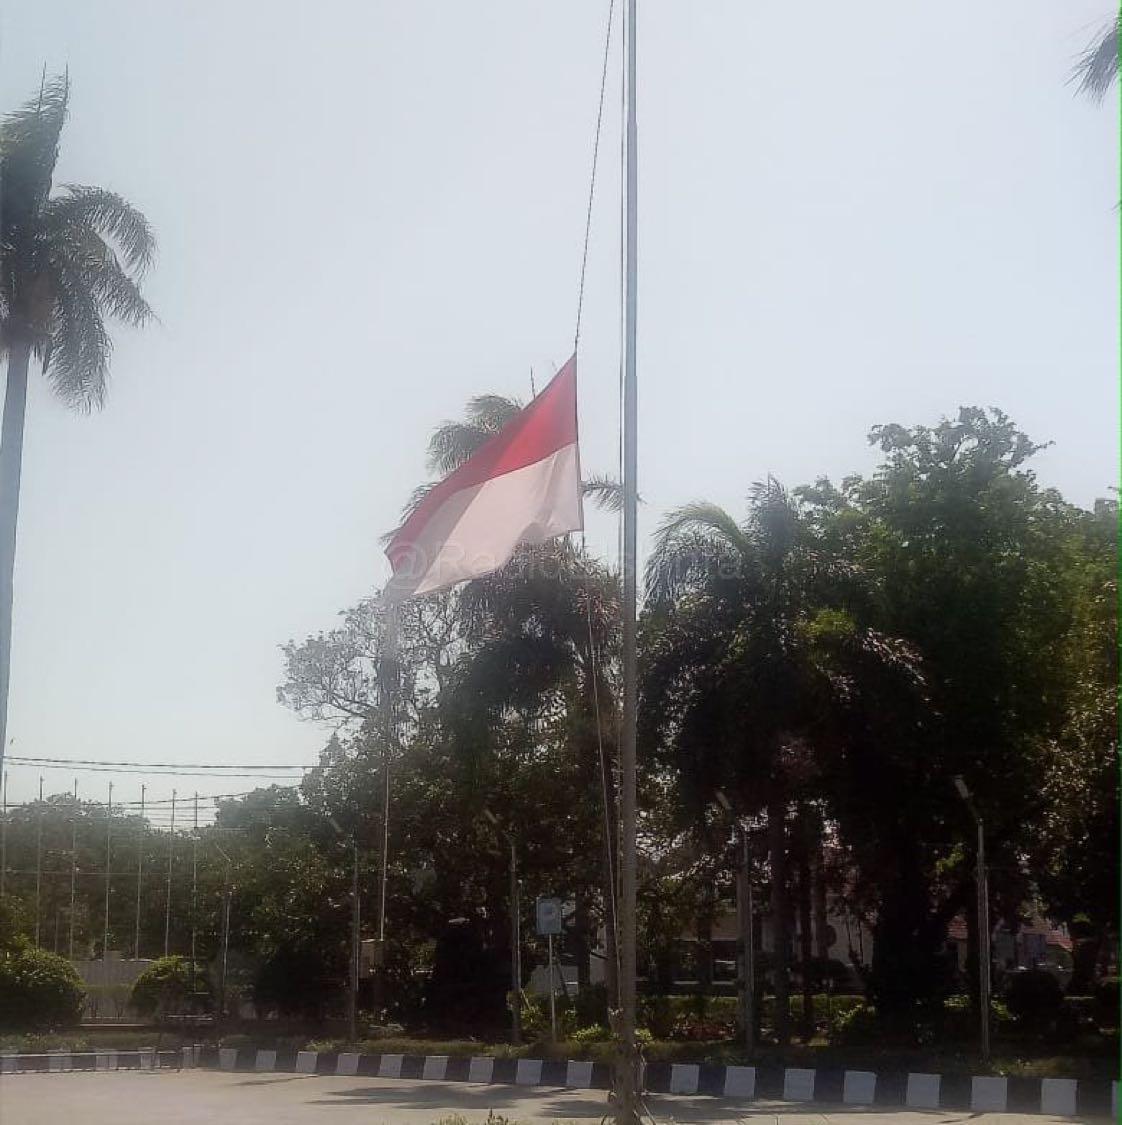 Pengibaran bendera setengah tiang di beberapa daerah di Kabupaten Majalengka terus dikibarkan mengingat pentingnya jasa-jasa Presiden ke 3 RI BJ Habibie sebagai anak bangsa yang jadi suri teladan dedikasi yang tinggi. (Tim)